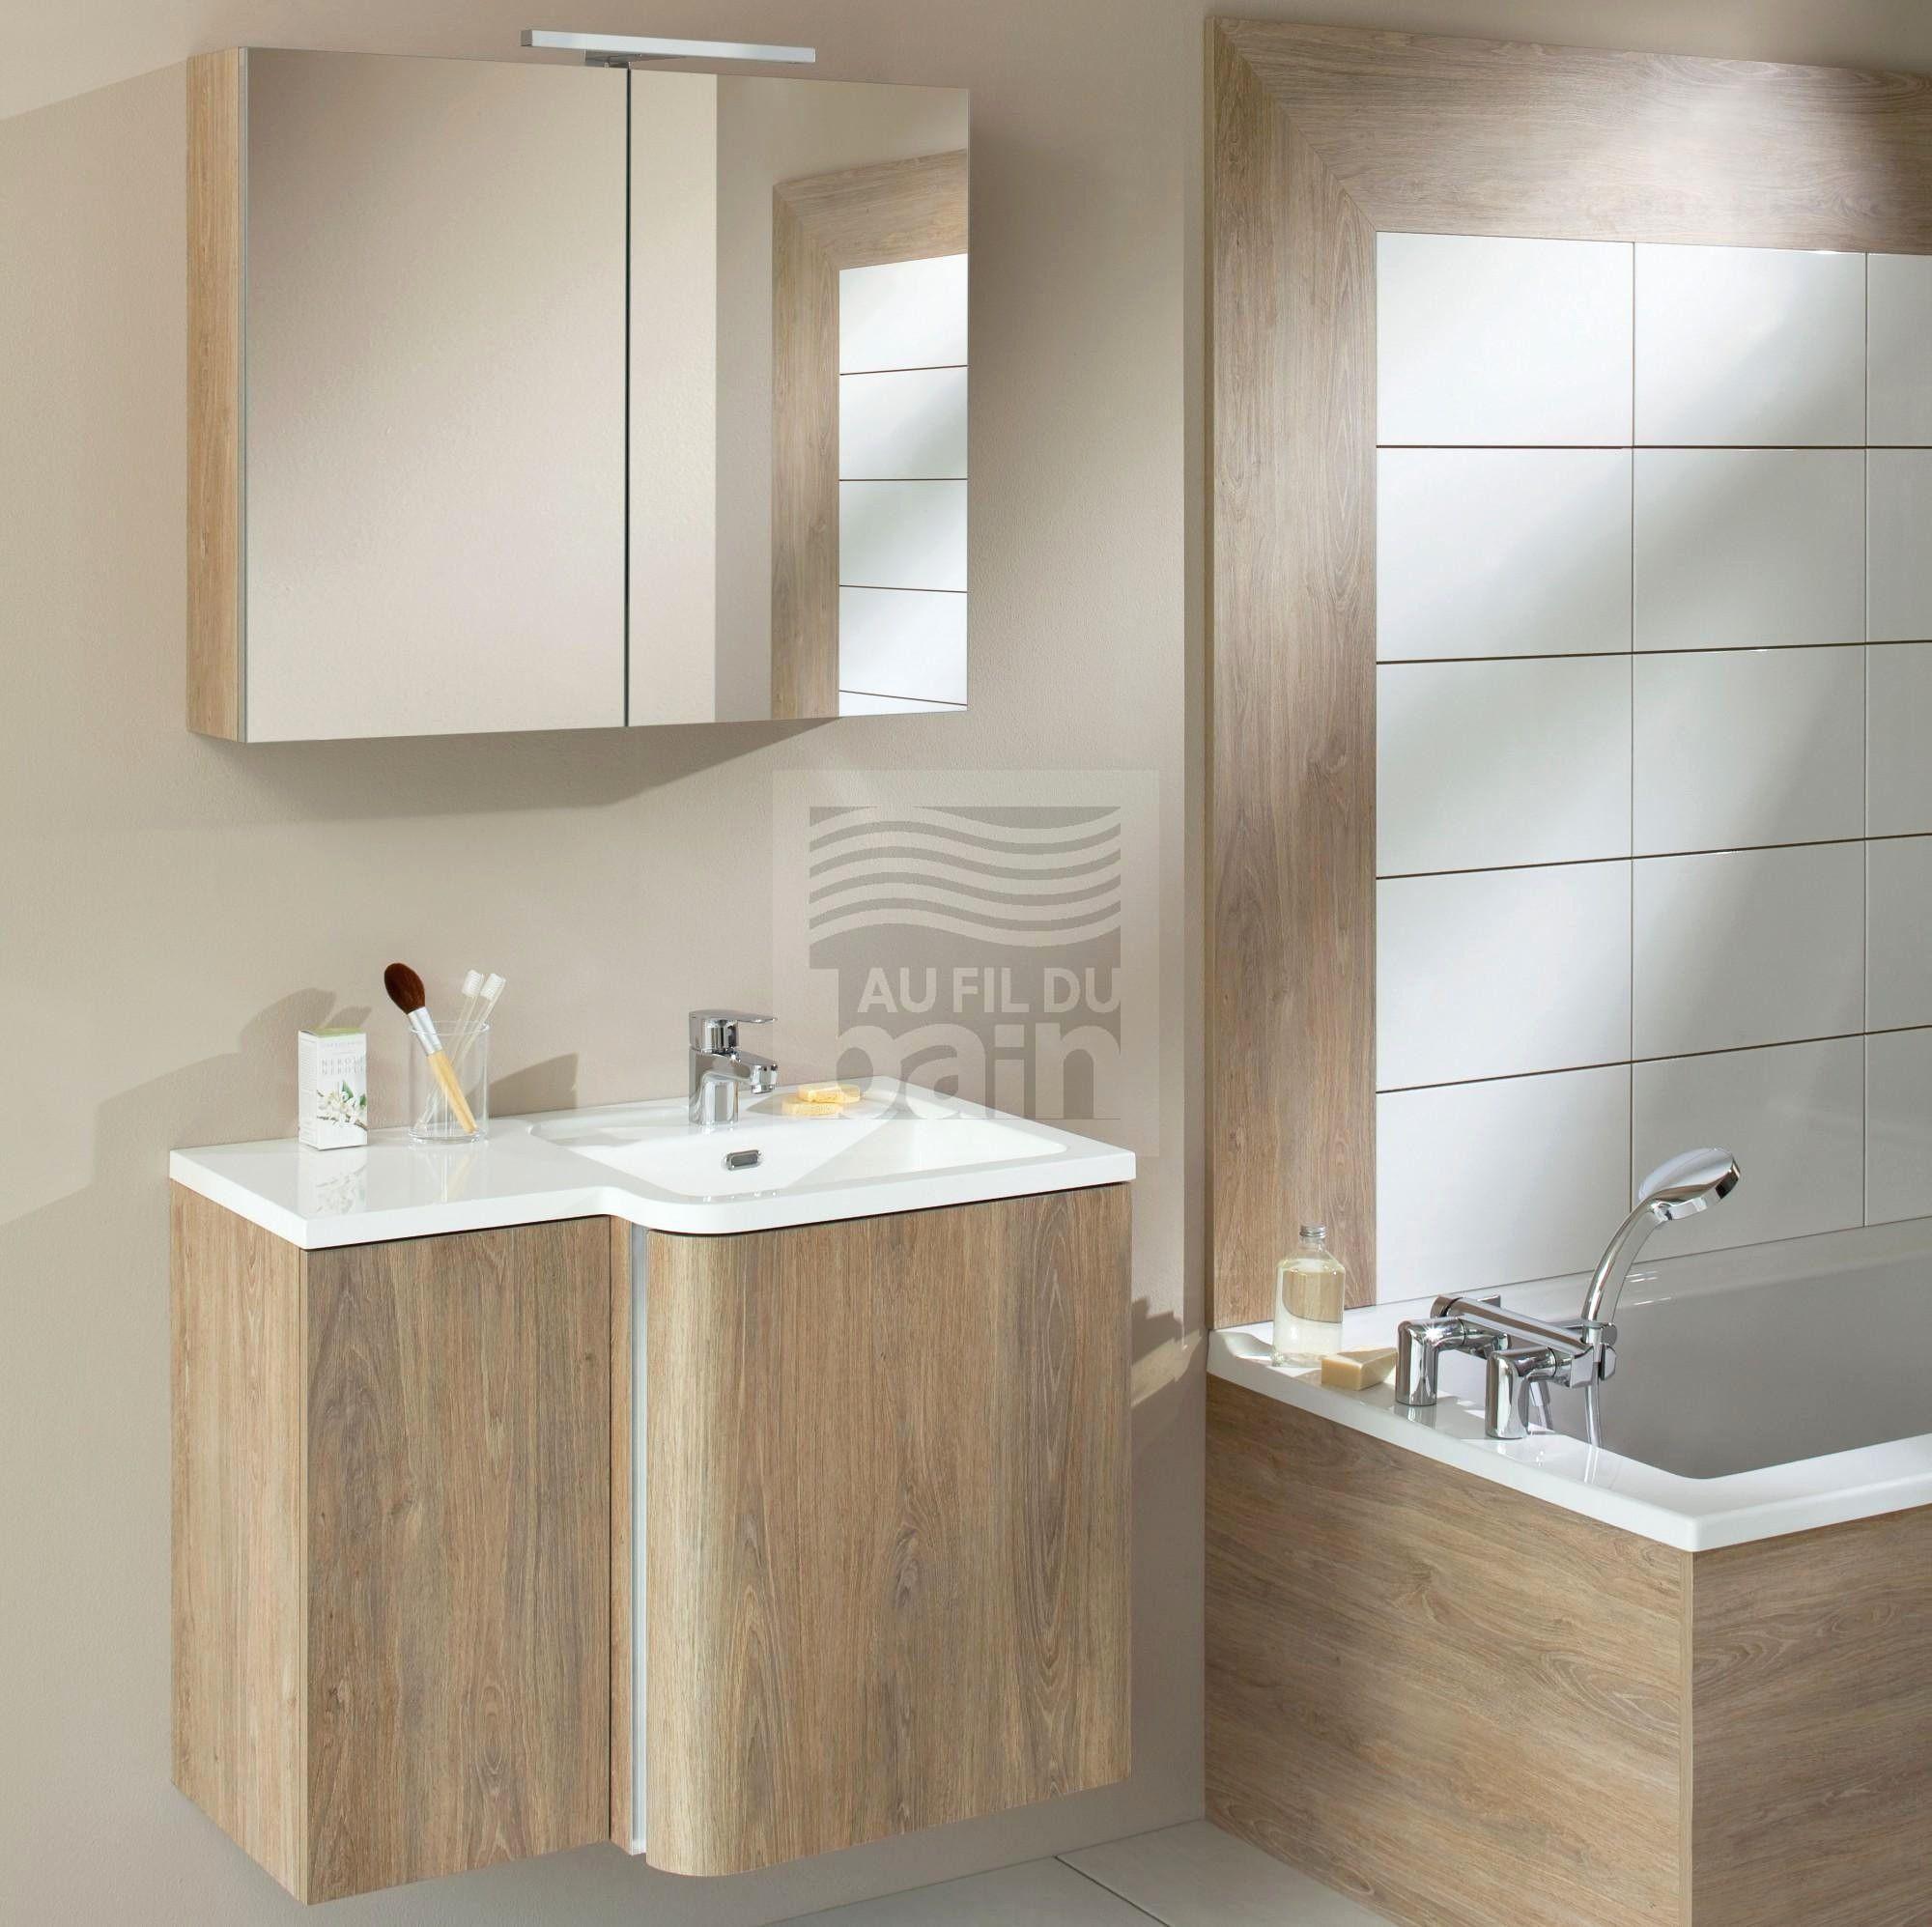 Luxury Meuble Vasque Profondeur 40 Meuble Salle De Bain Salle De Bain Design Amenagement Salle De Bain